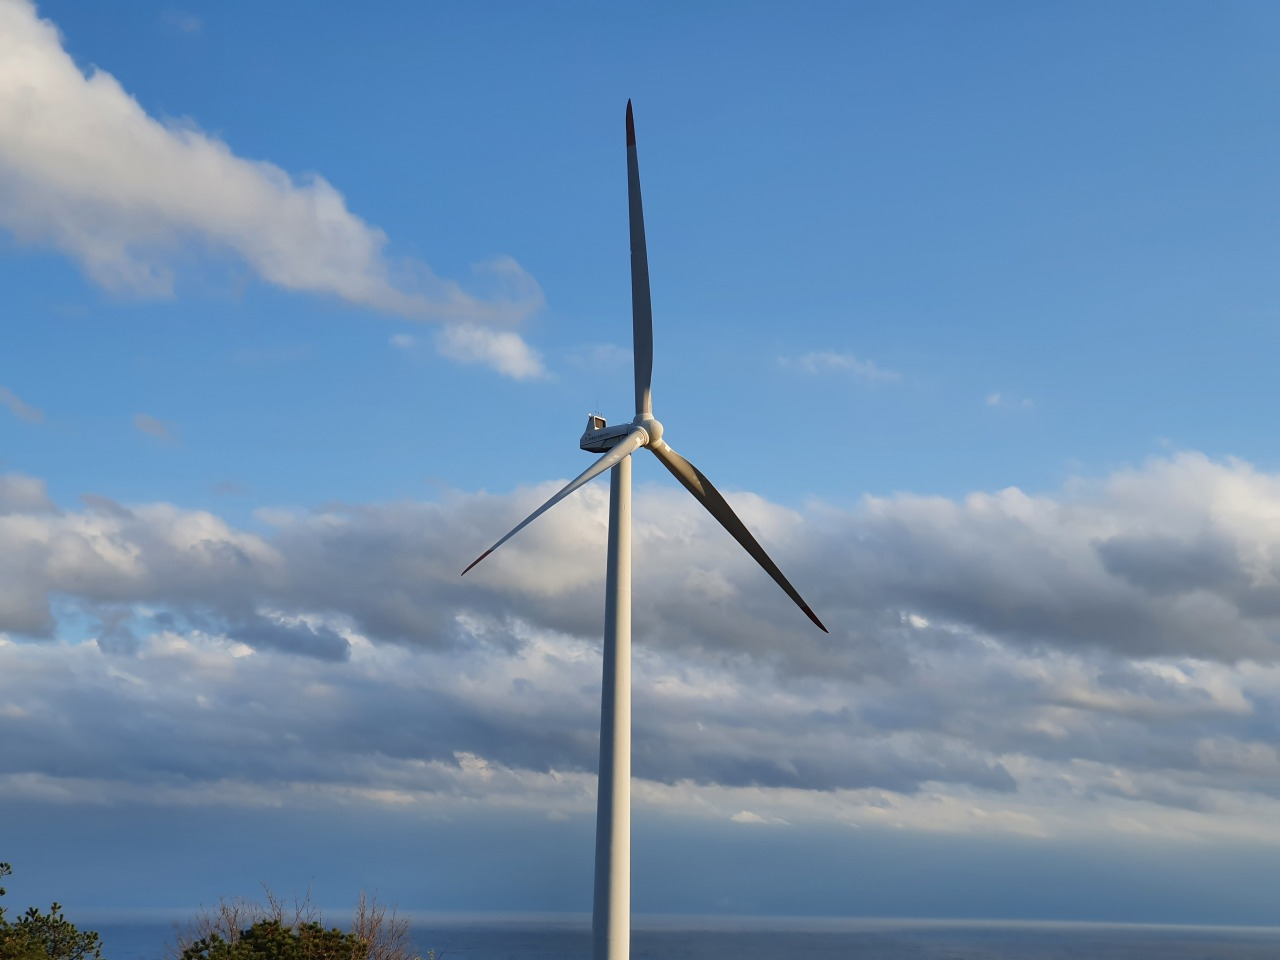 Unison's 1.65-megawatt wind turbine (Kim Byung-wook/The Korea Herald)